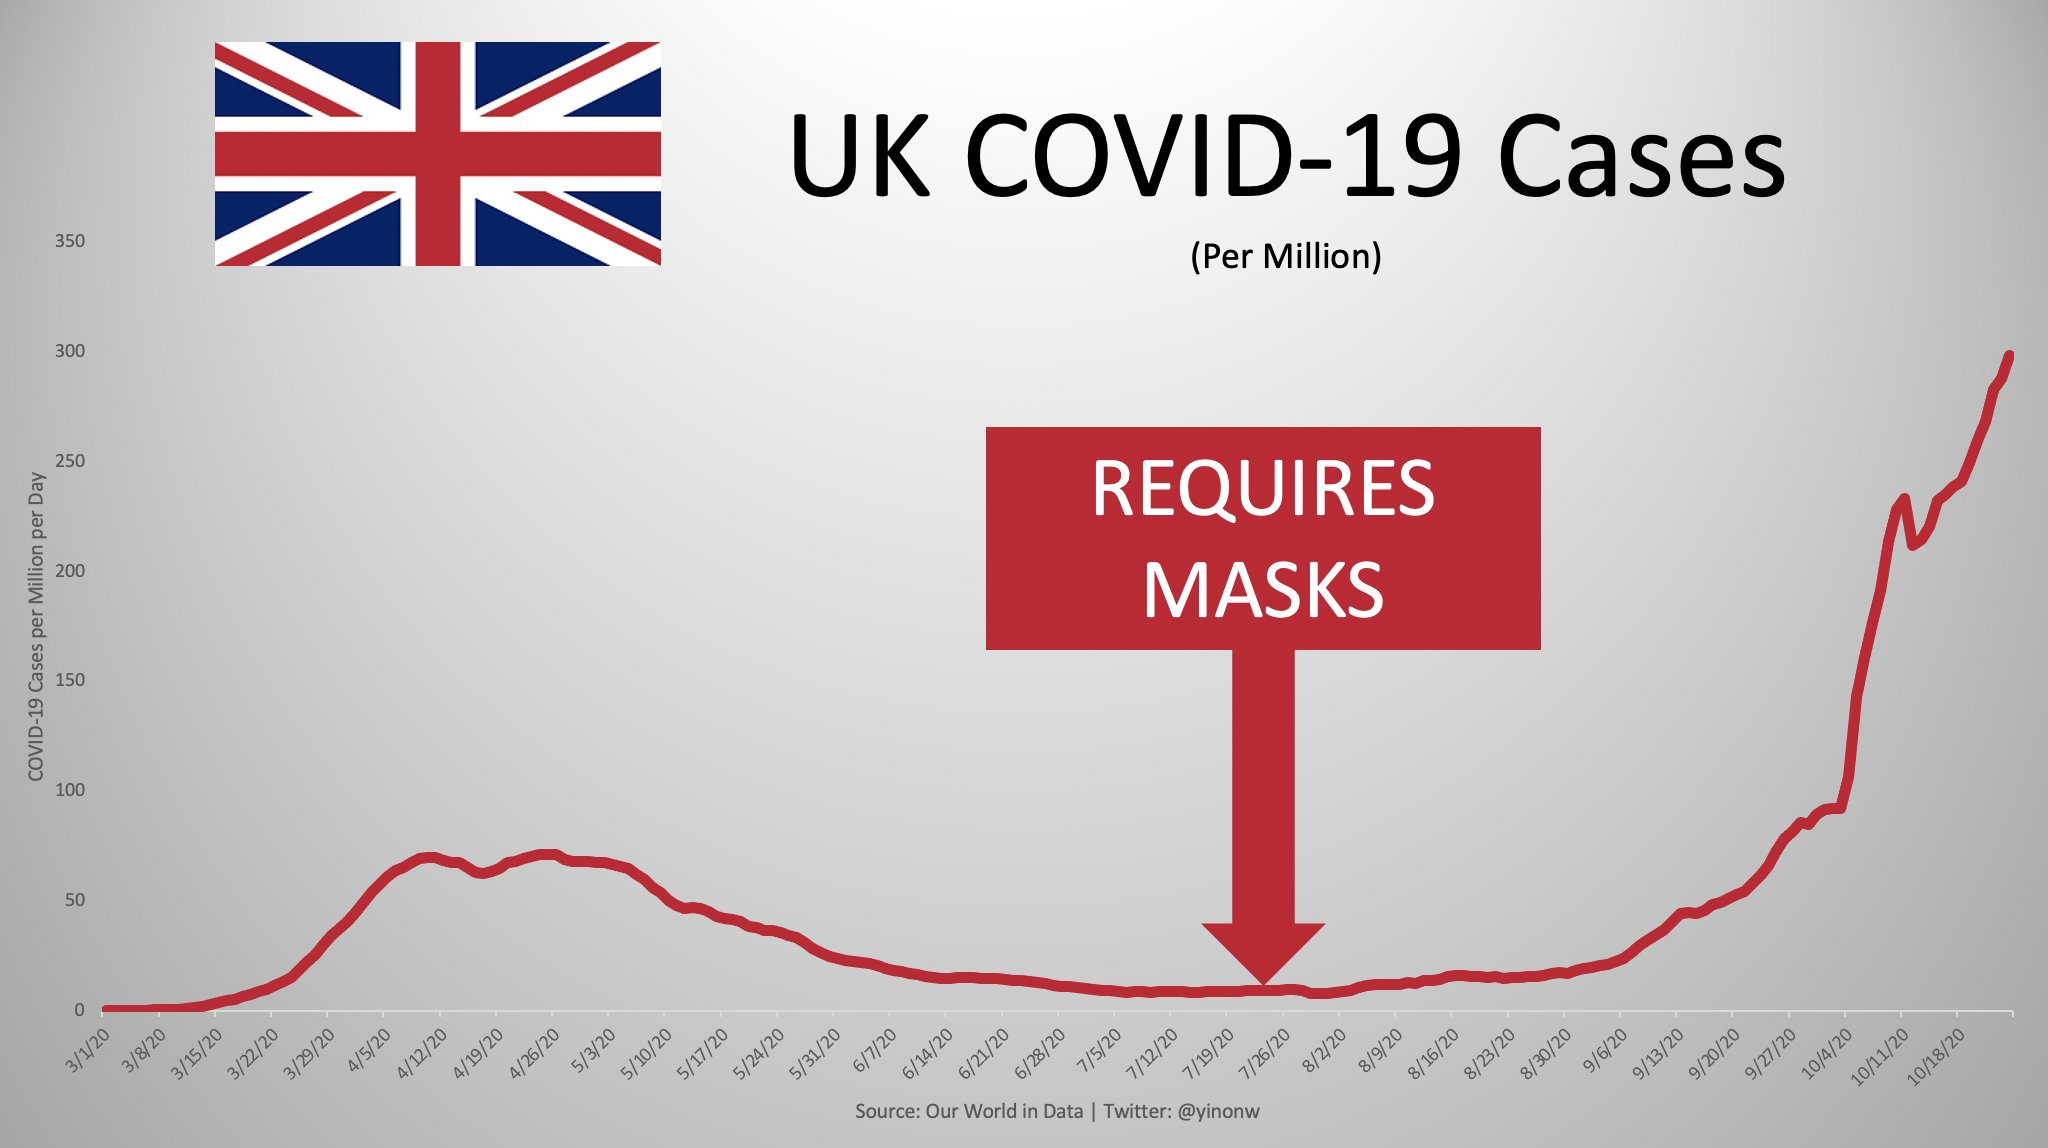 Are Face Masks Effective? The Evidence. Masks-uk-1